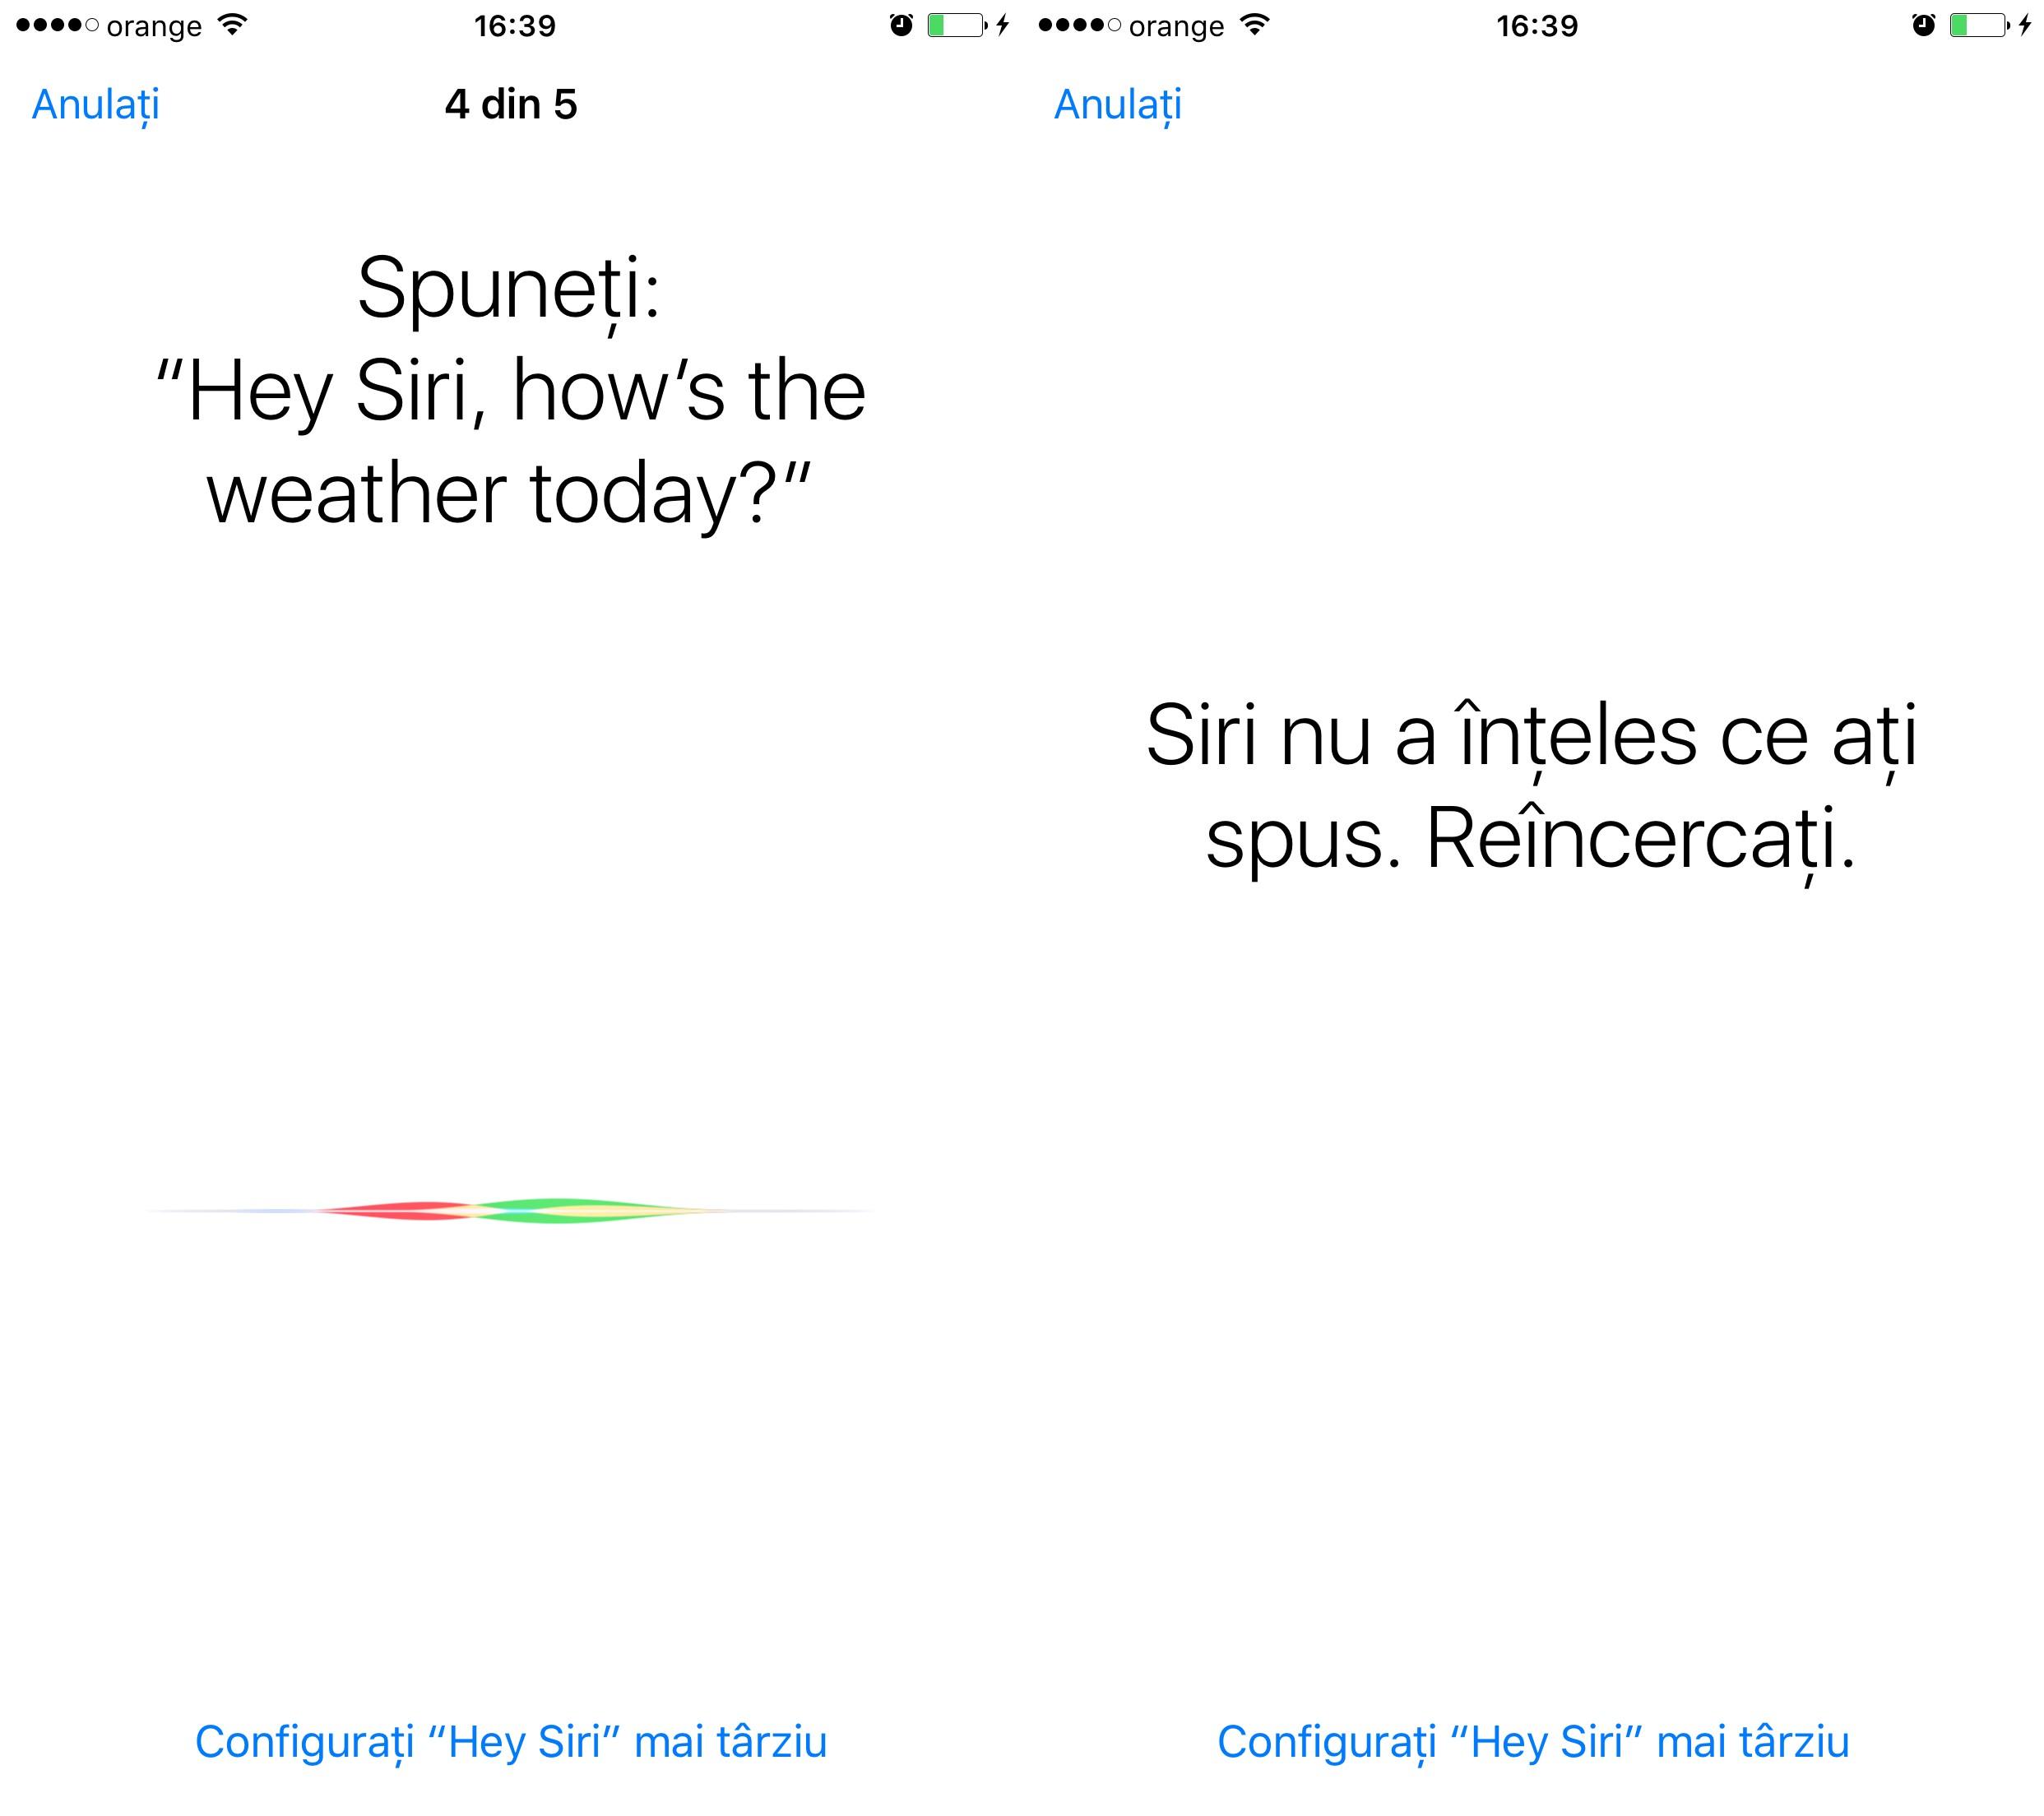 Configurare Hey Siri iOS 9 2